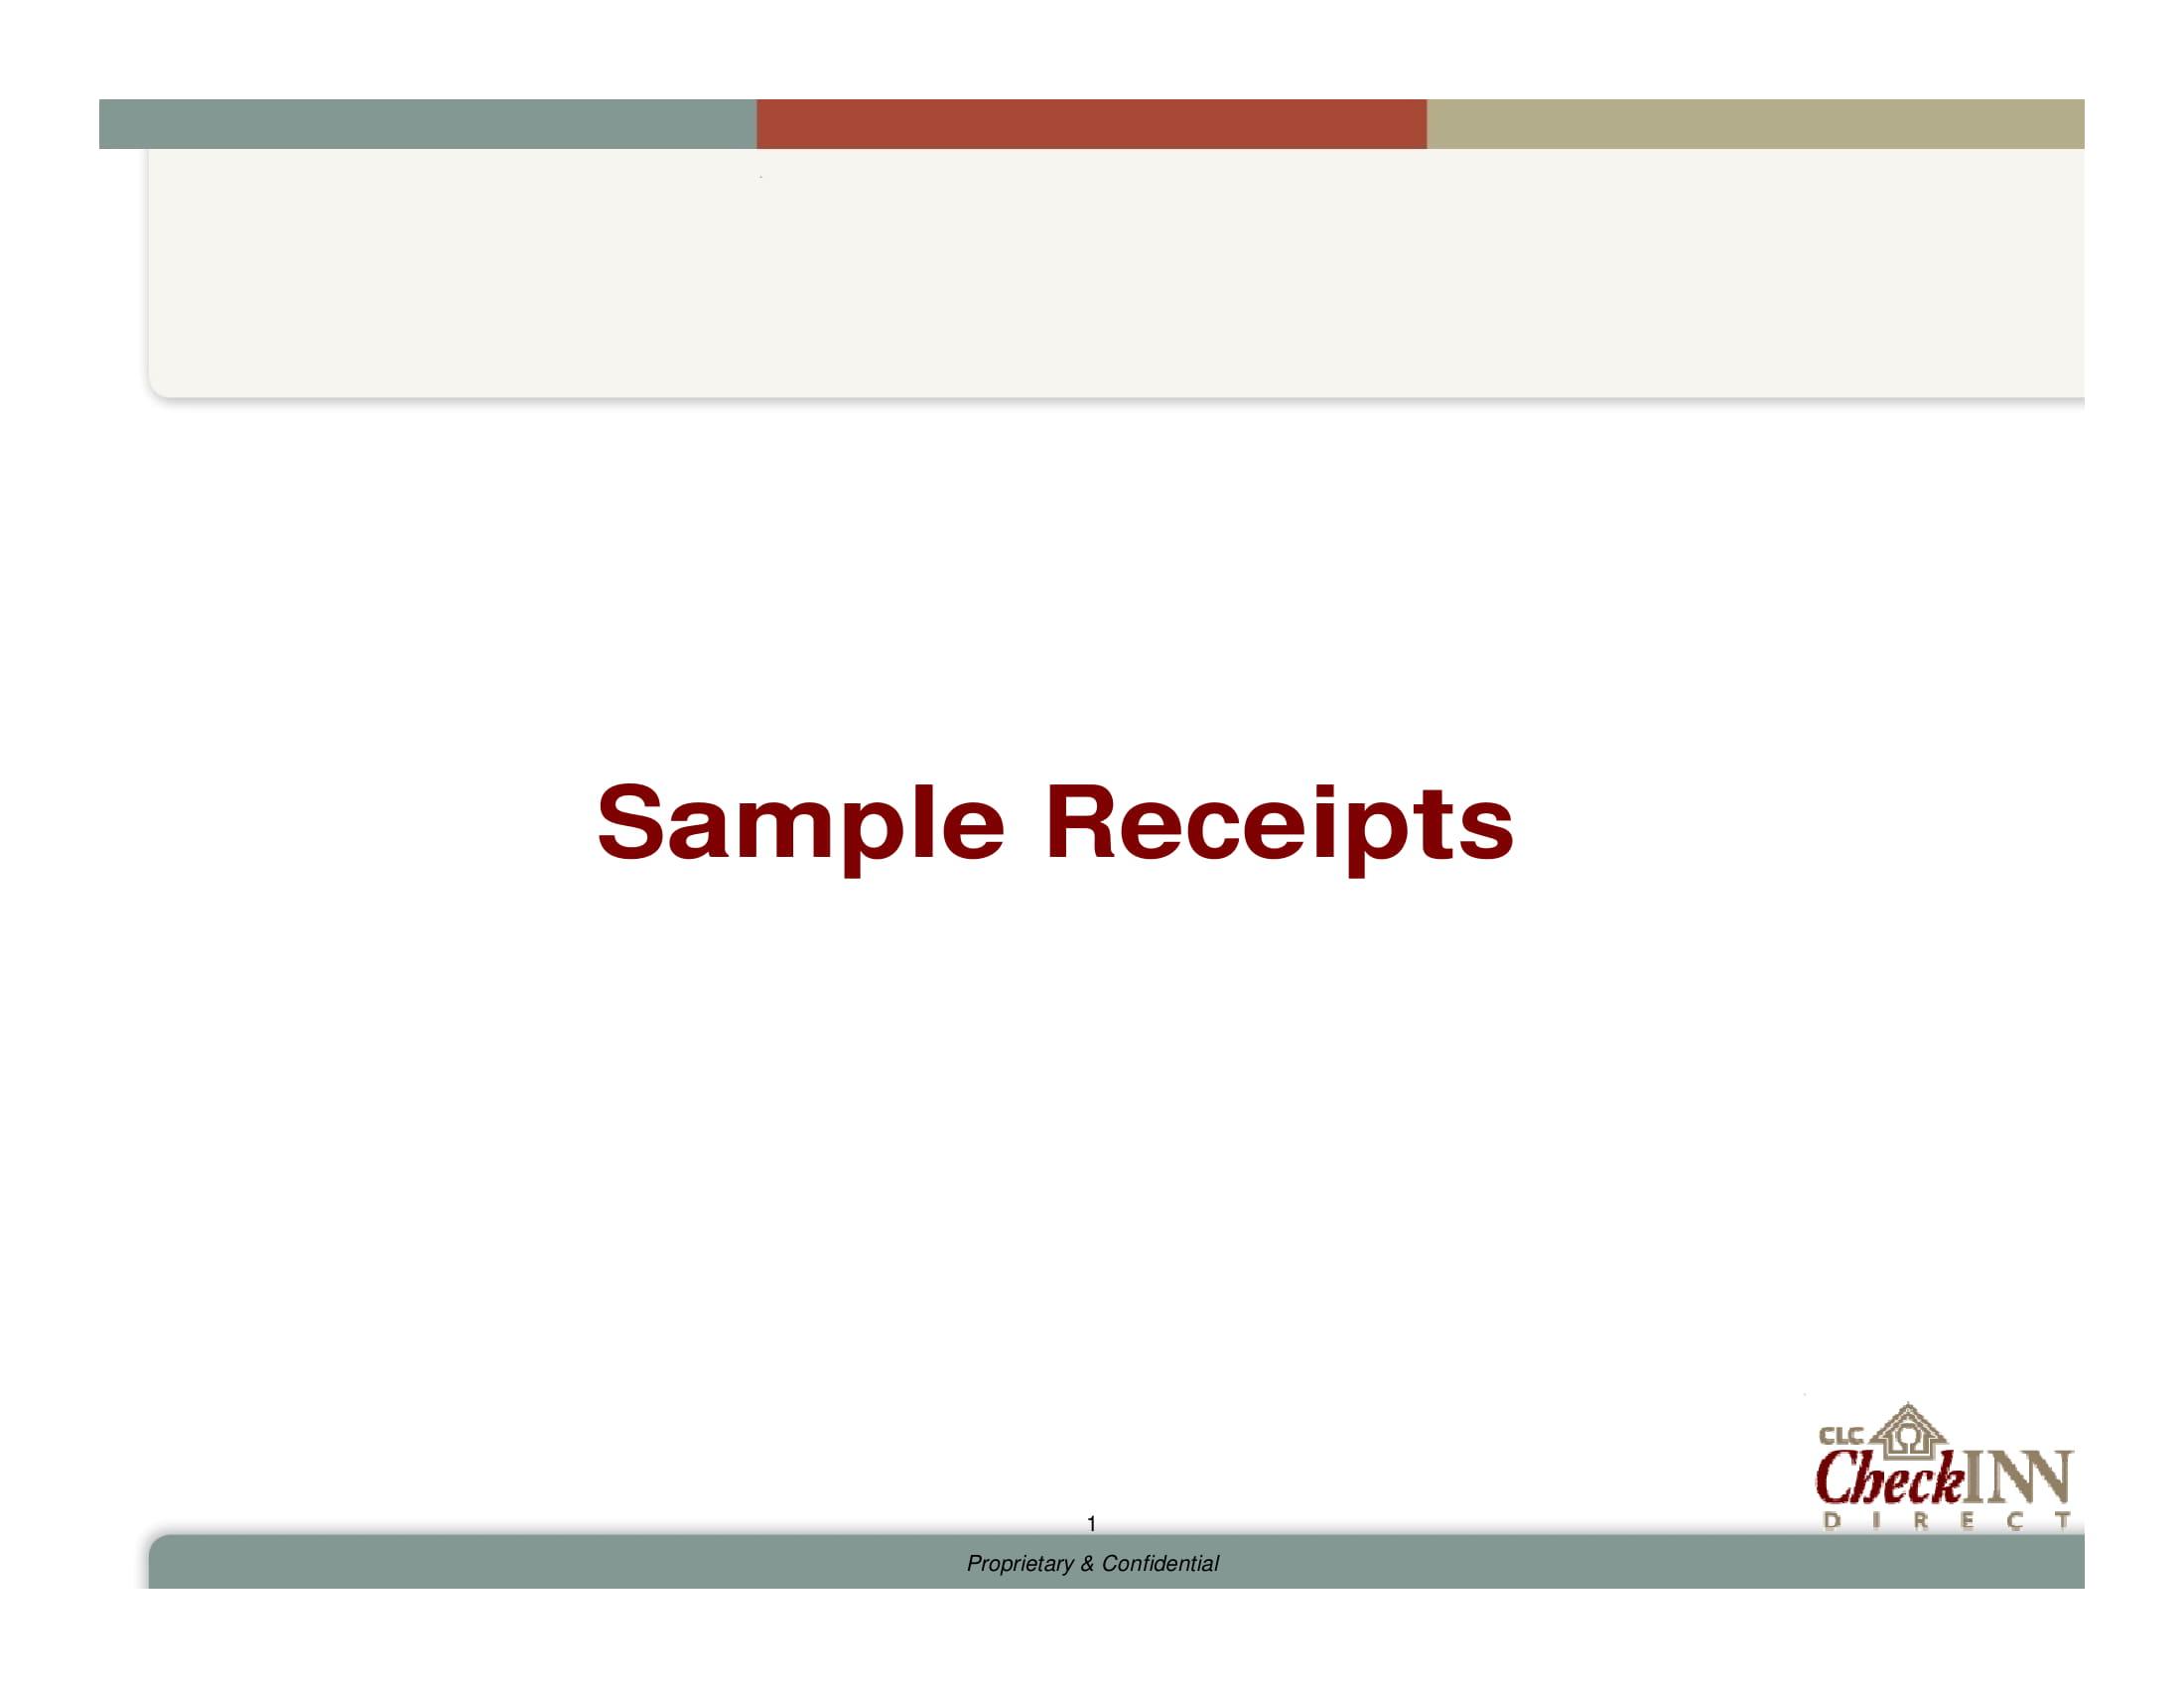 clc sample receipts